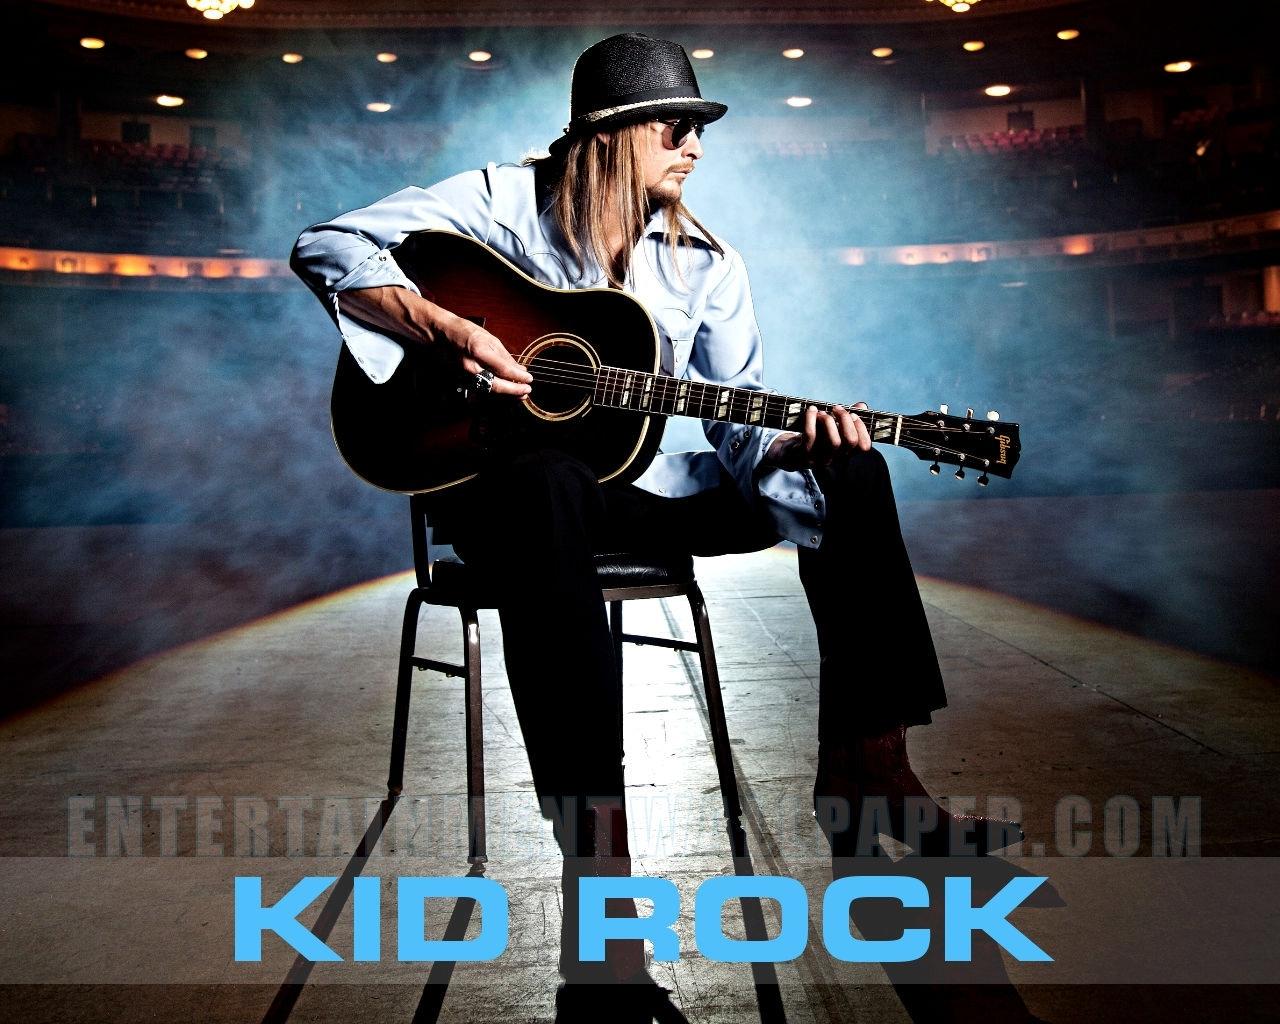 kid rock wallpaper - #40026260 (1280x1024) | desktop download page